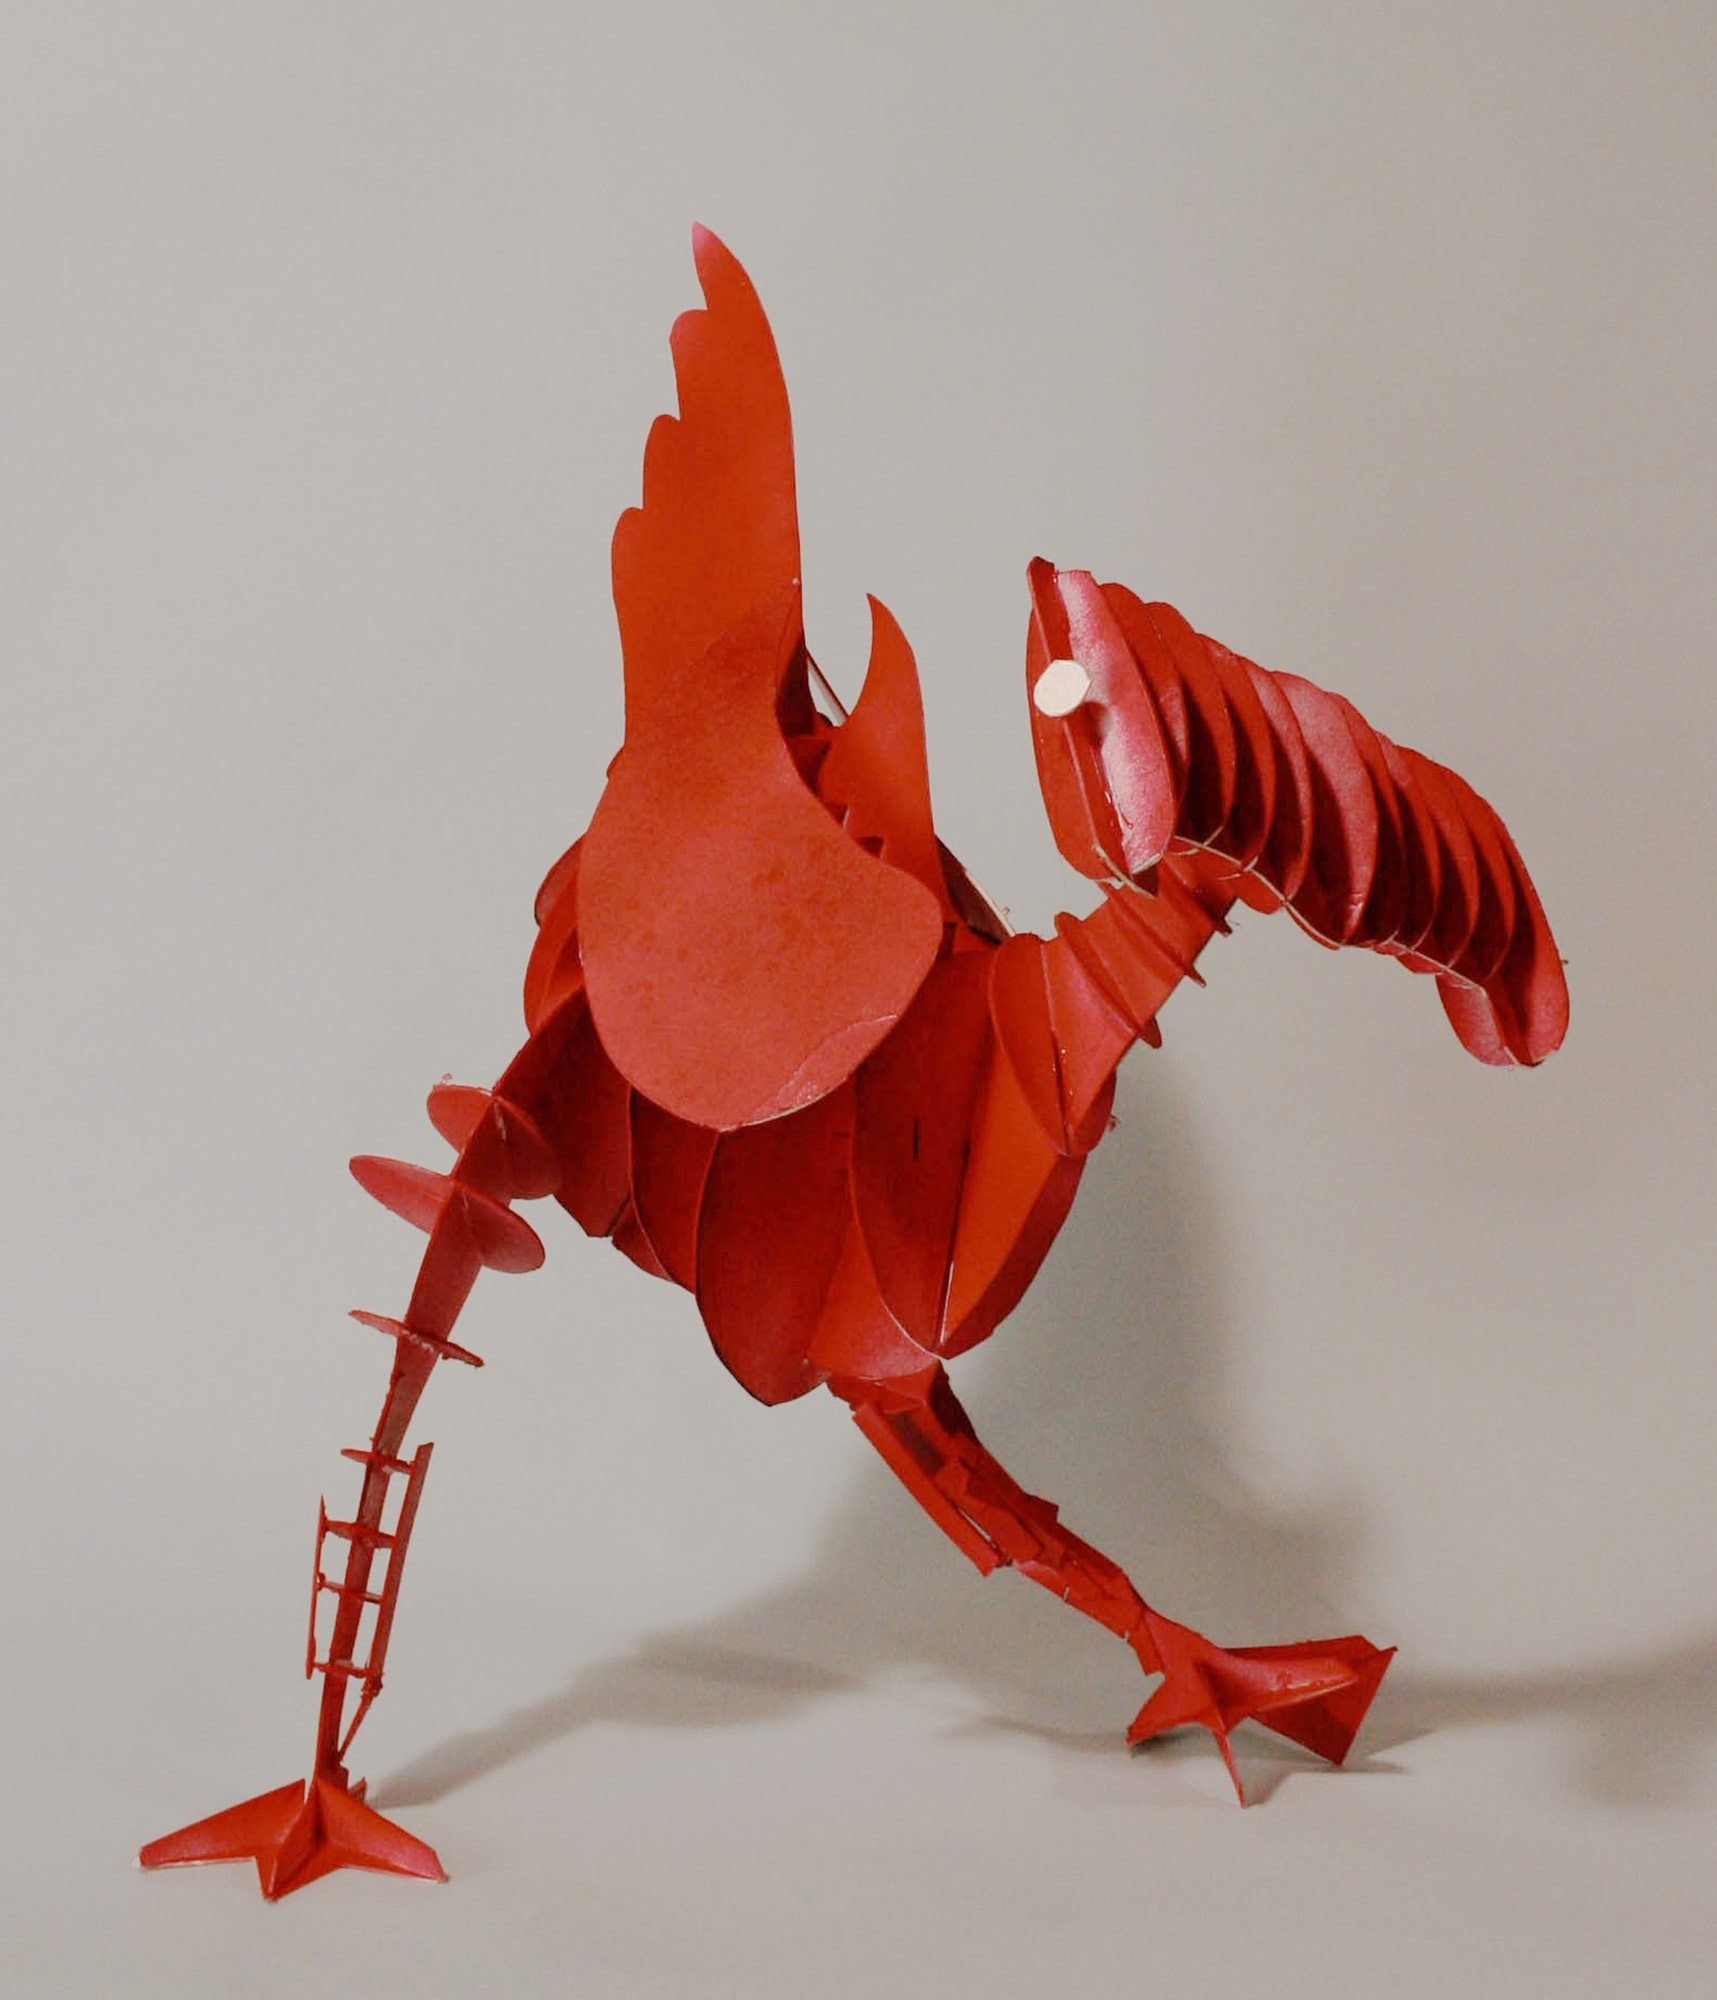 Red rooster made of Taskboard cardboard